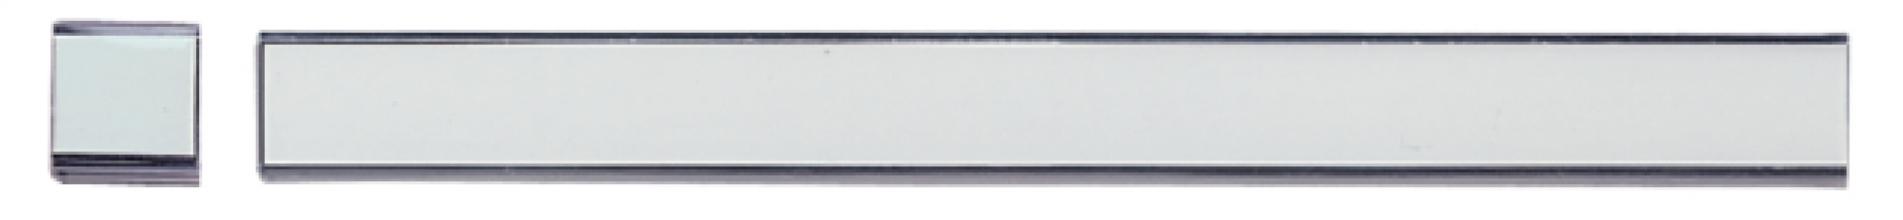 Planbord verbindingsprofiel A5545-012 2stuks